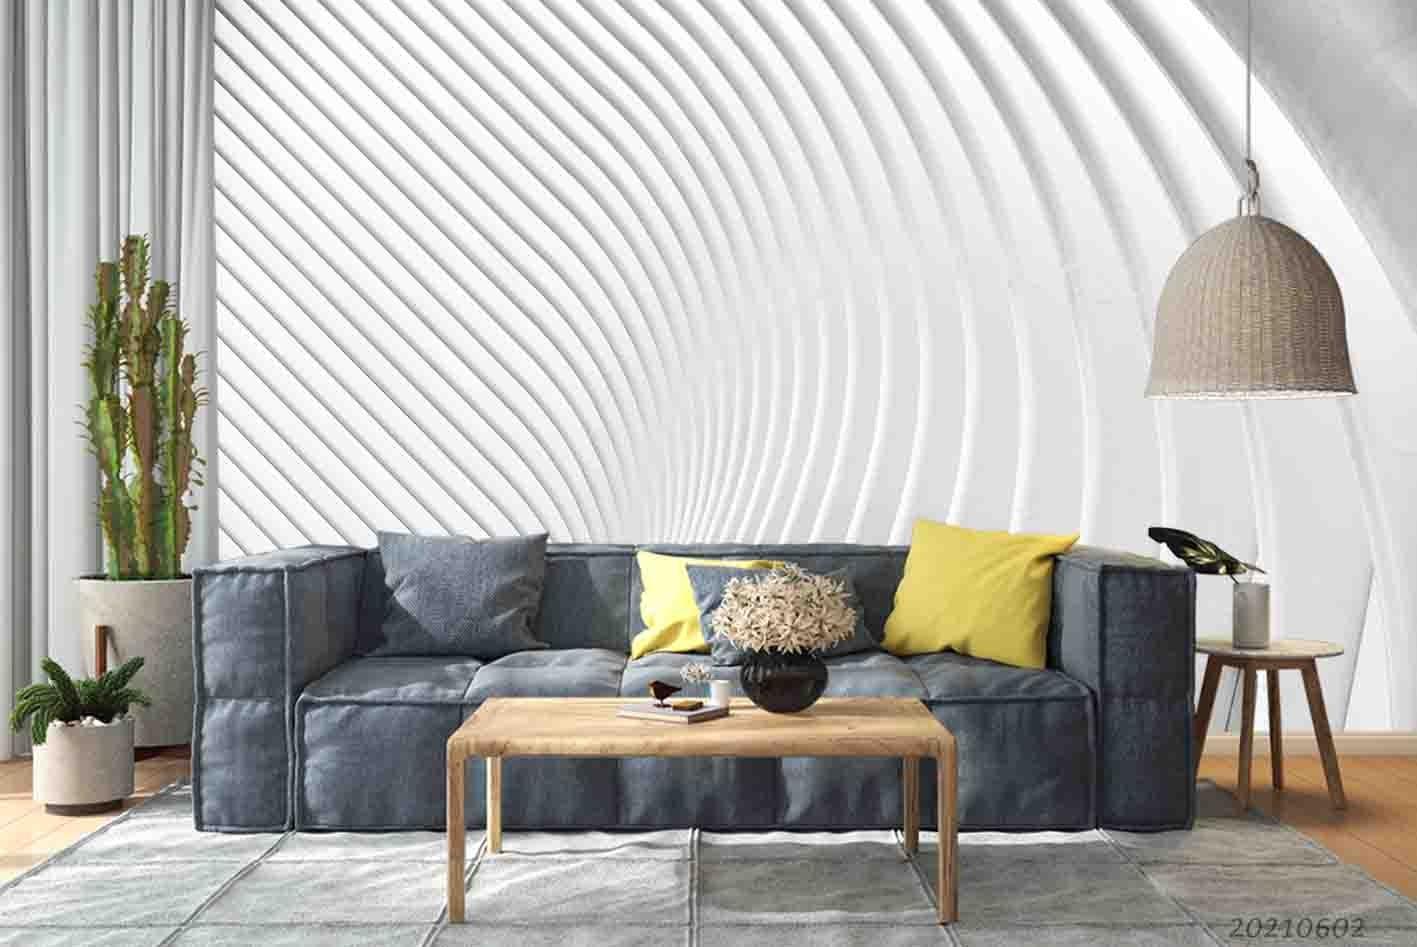 3D Artistic Relief Effect Elegance Gypsum Wall Mural Wallpaper SWW874